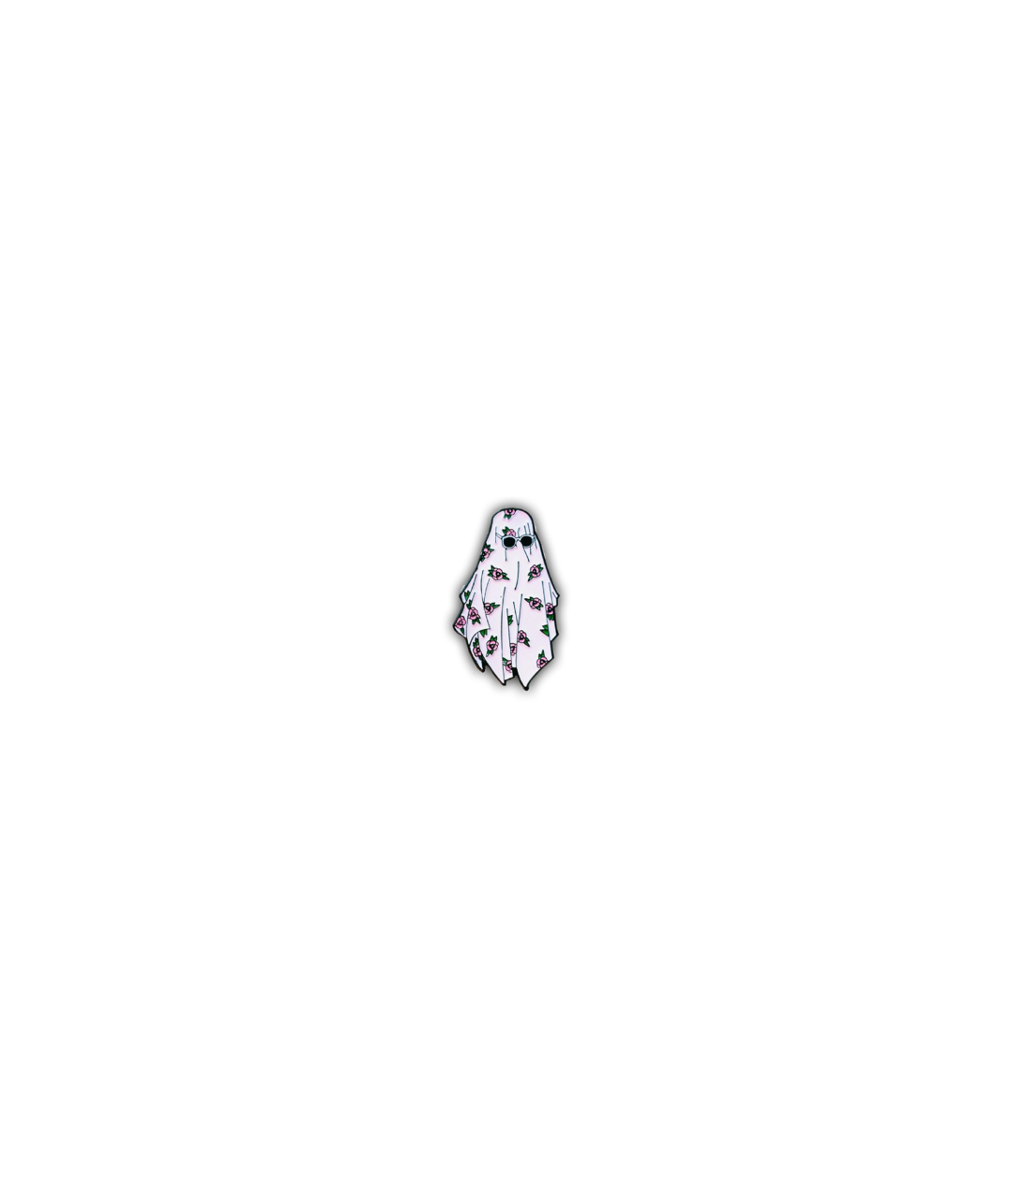 #twentyonepilots #joshdun #tylerjoseph #top #ghosts #complex #overlays #overlay #trench #blurryface #twentyønepiløts #freetoedit